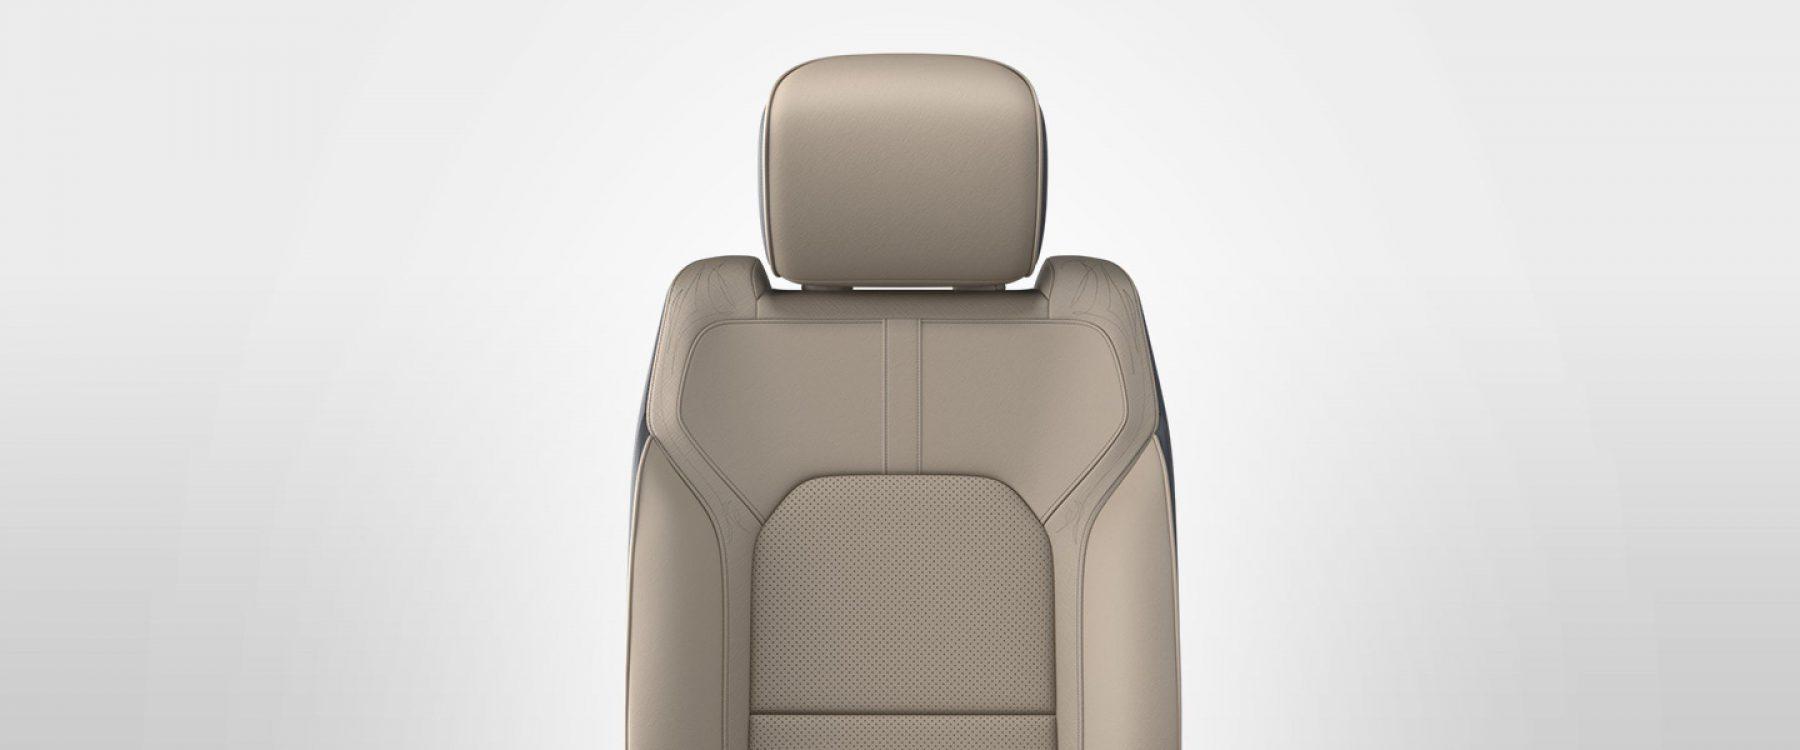 019 Ram 1500 Interior Seats Limited Natura plus indigo light frost beige